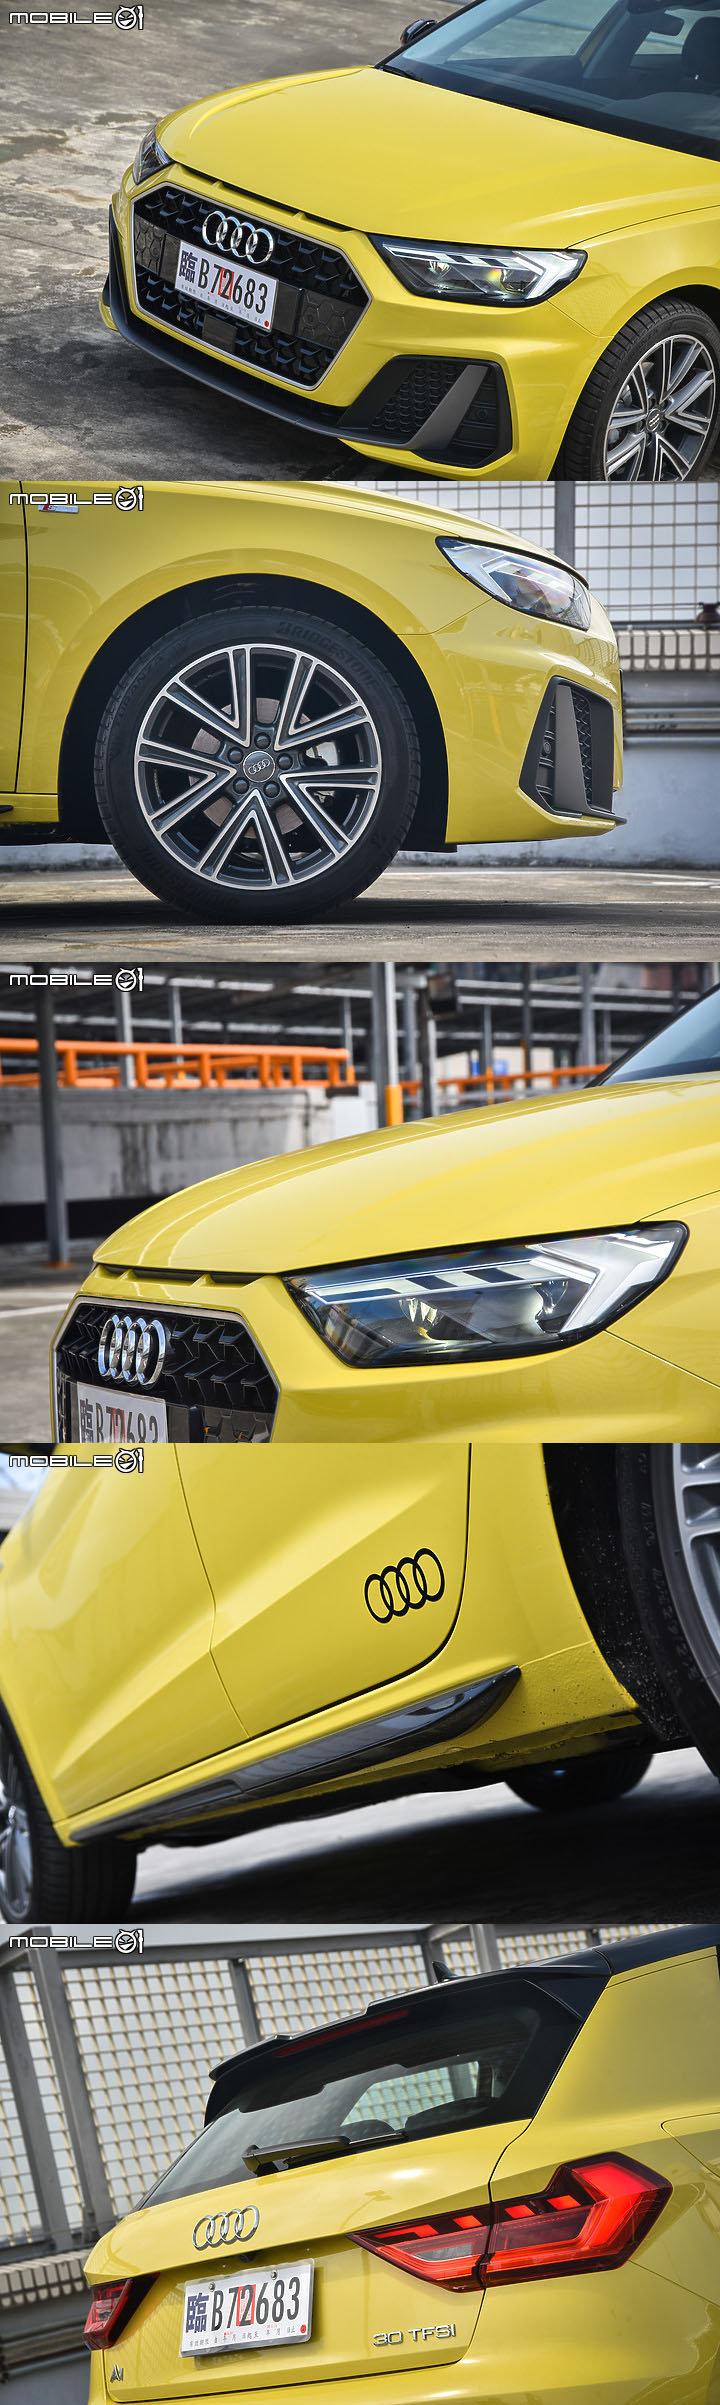 Audi New A1 Sportback 30 TFSI S line //  (PIC:mobile01)